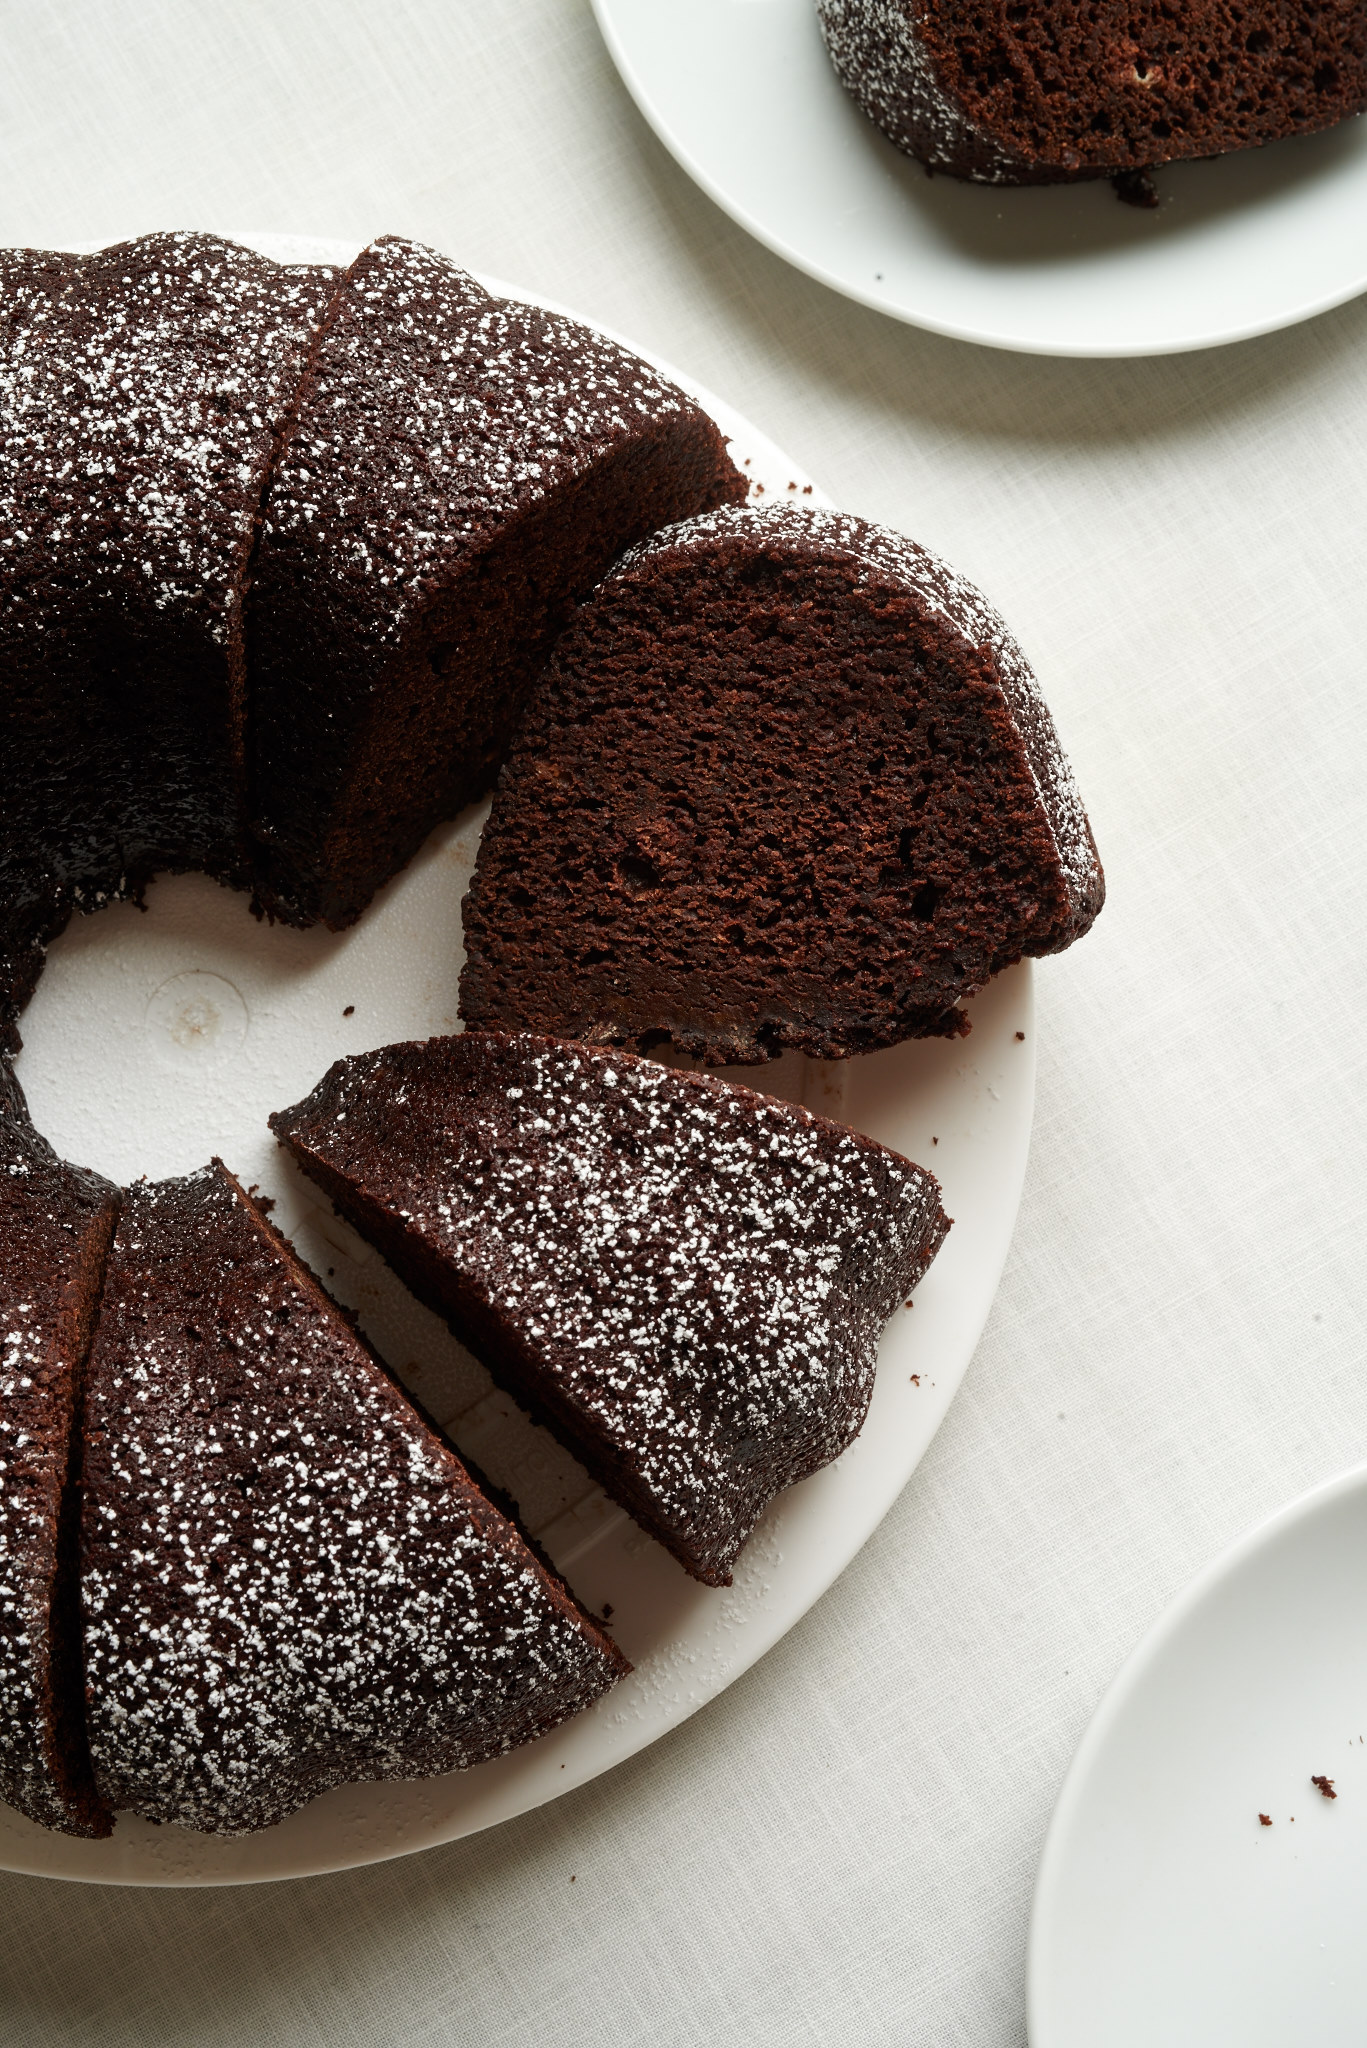 Mexican Chocolate Bundt Cake #Bundtbakers - I bake he shoots